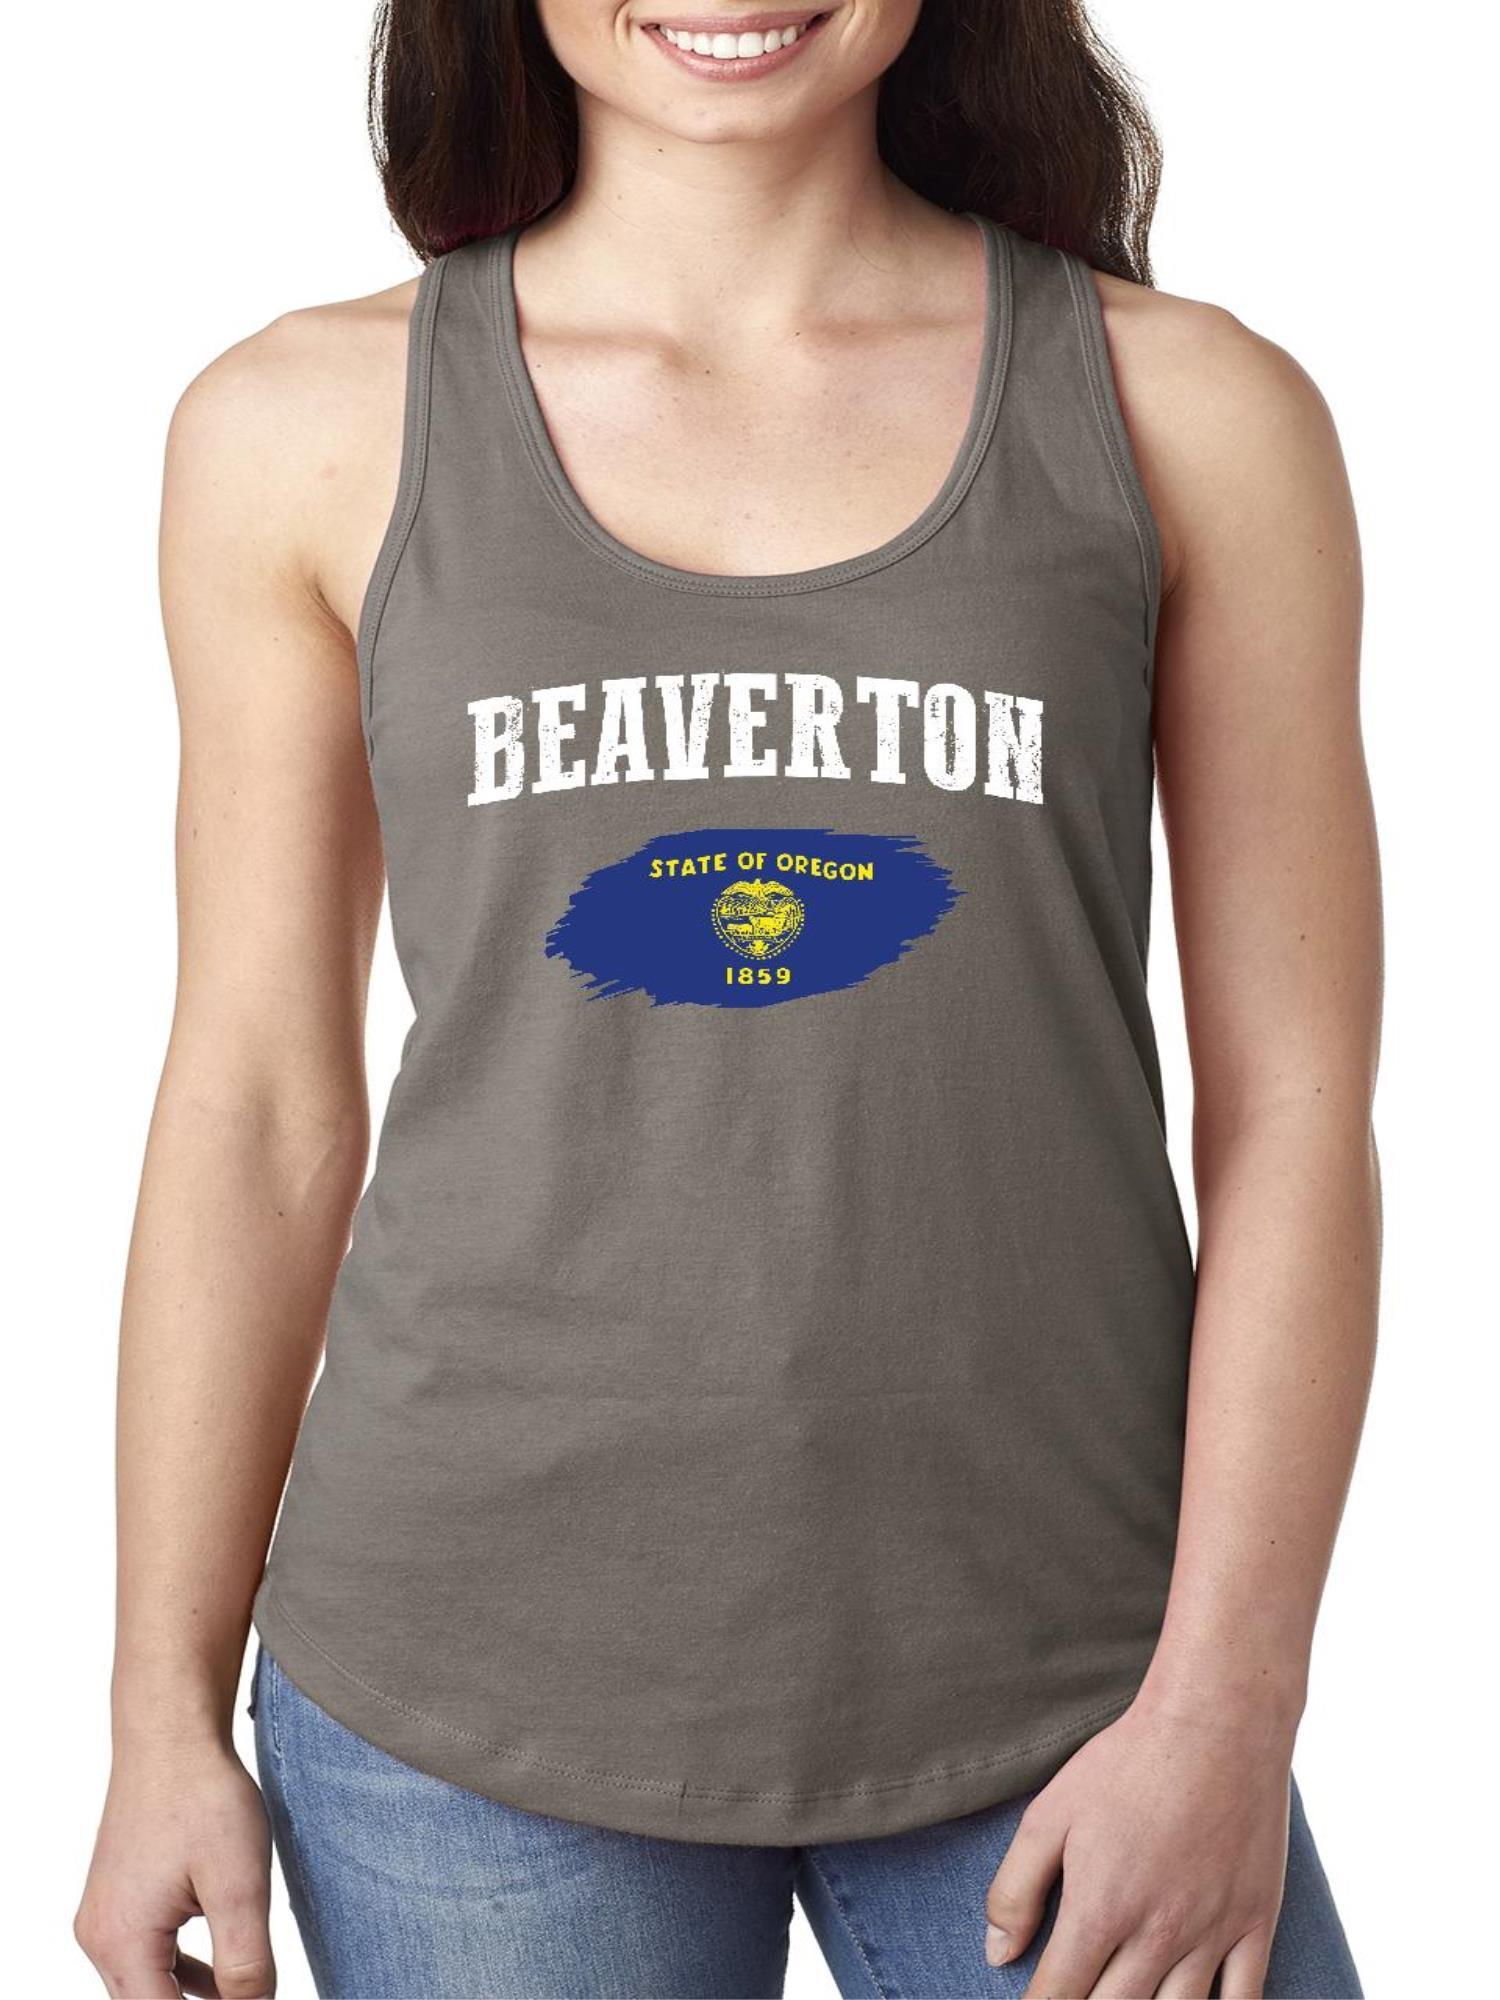 beaverton oregon women tops next level racerback tank top - walmart